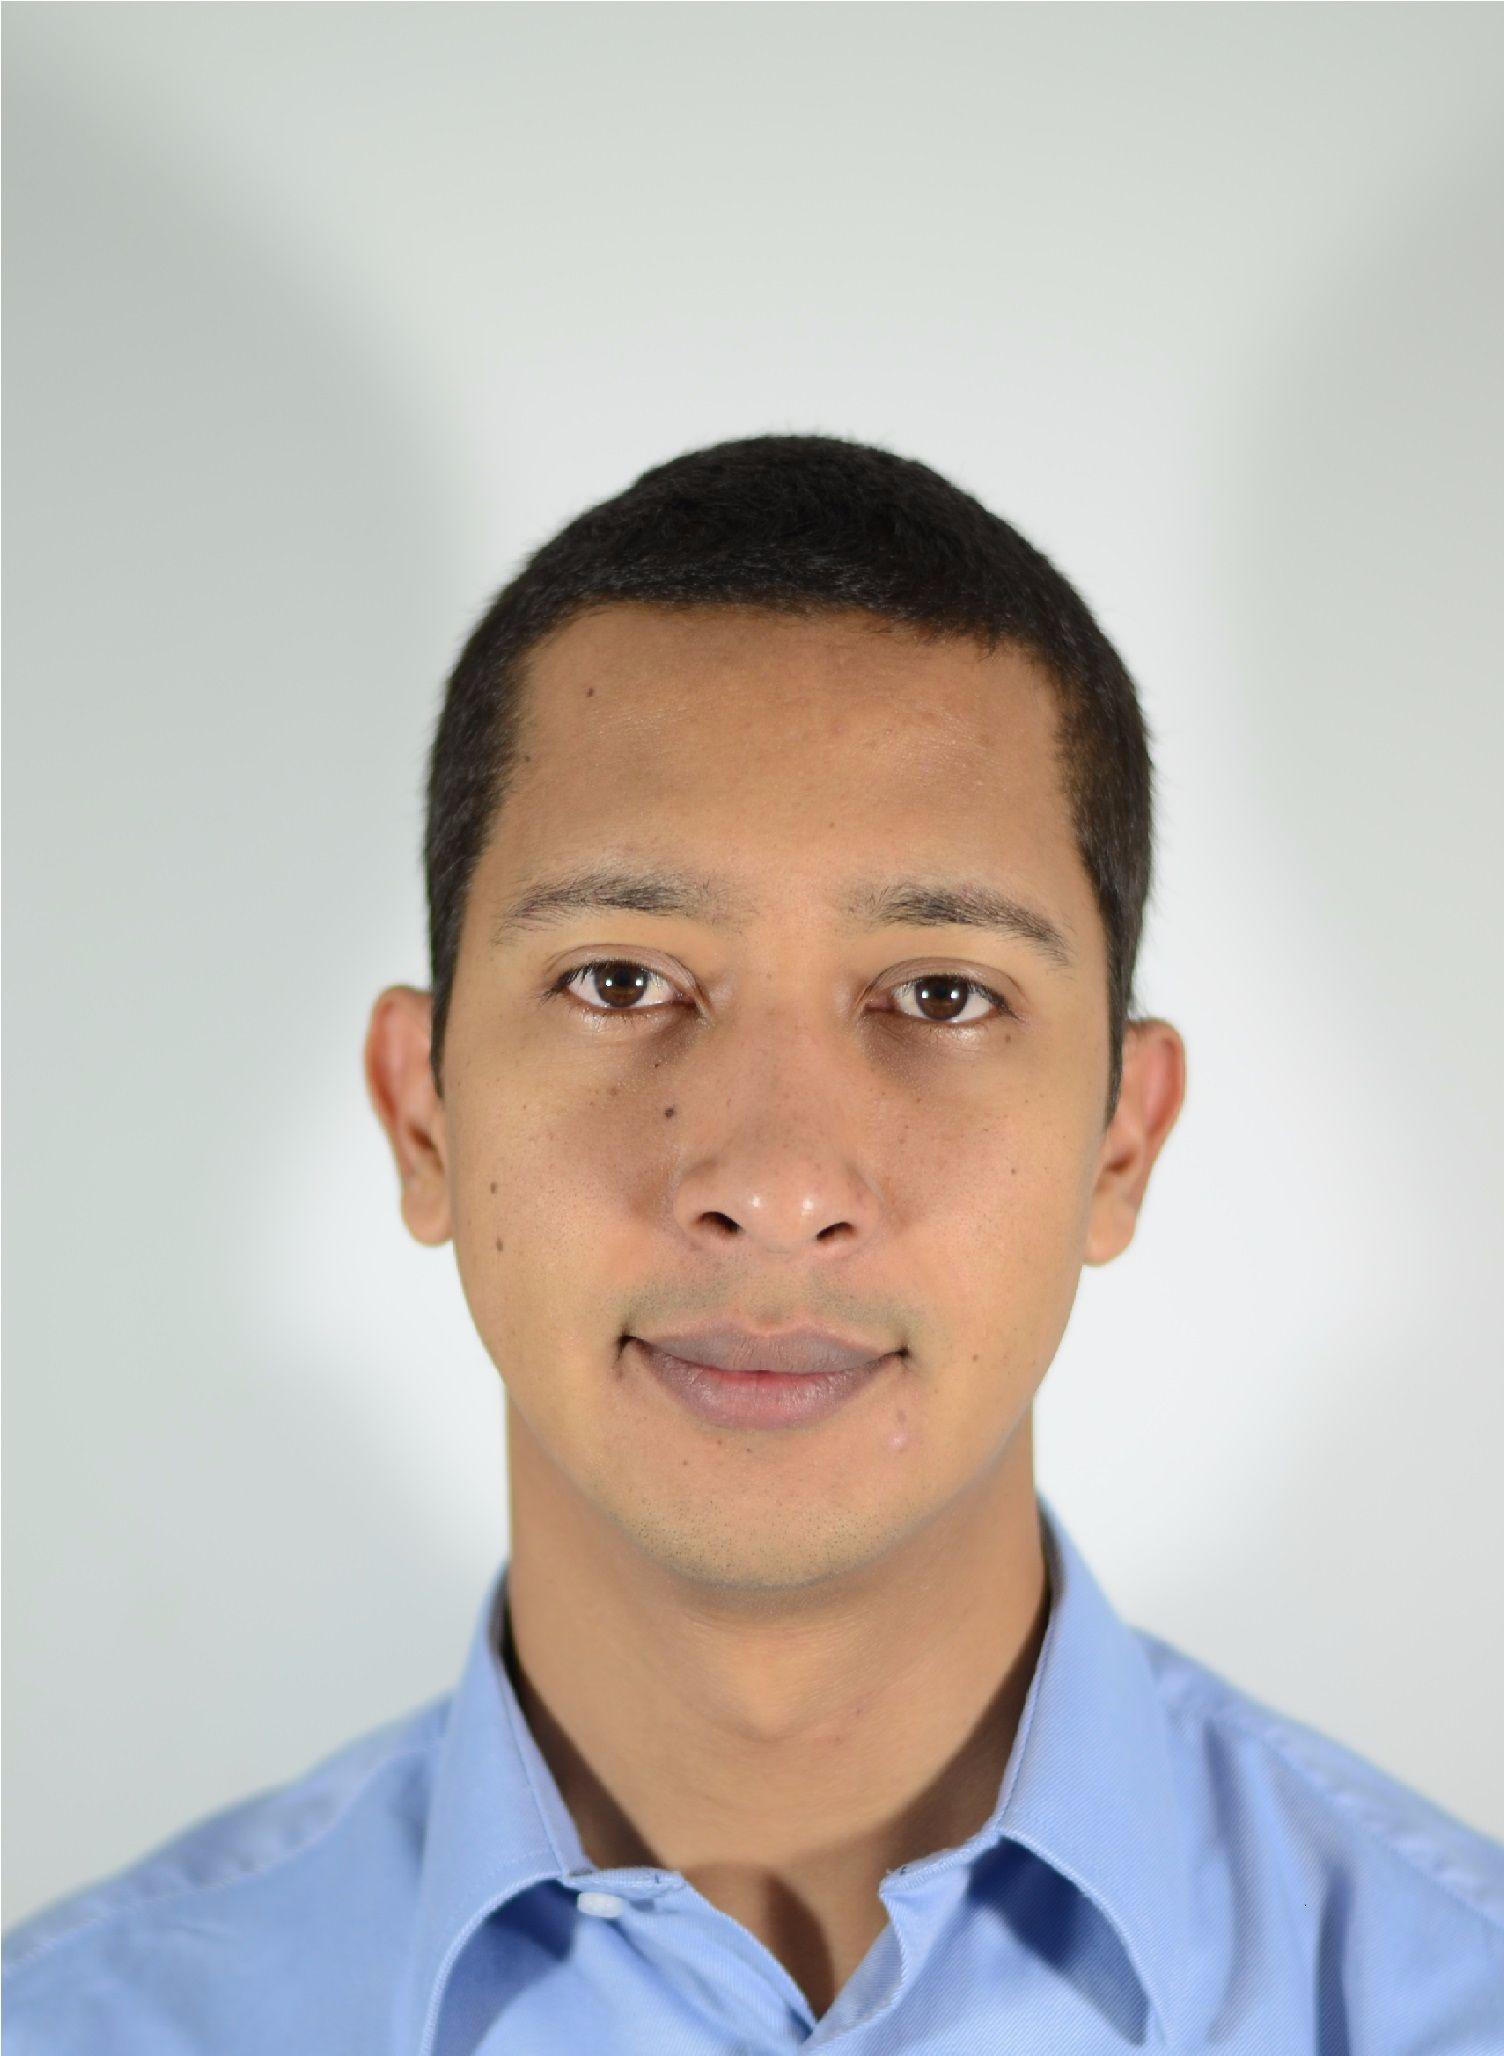 Java stream mentor, Java stream expert, Java stream code help